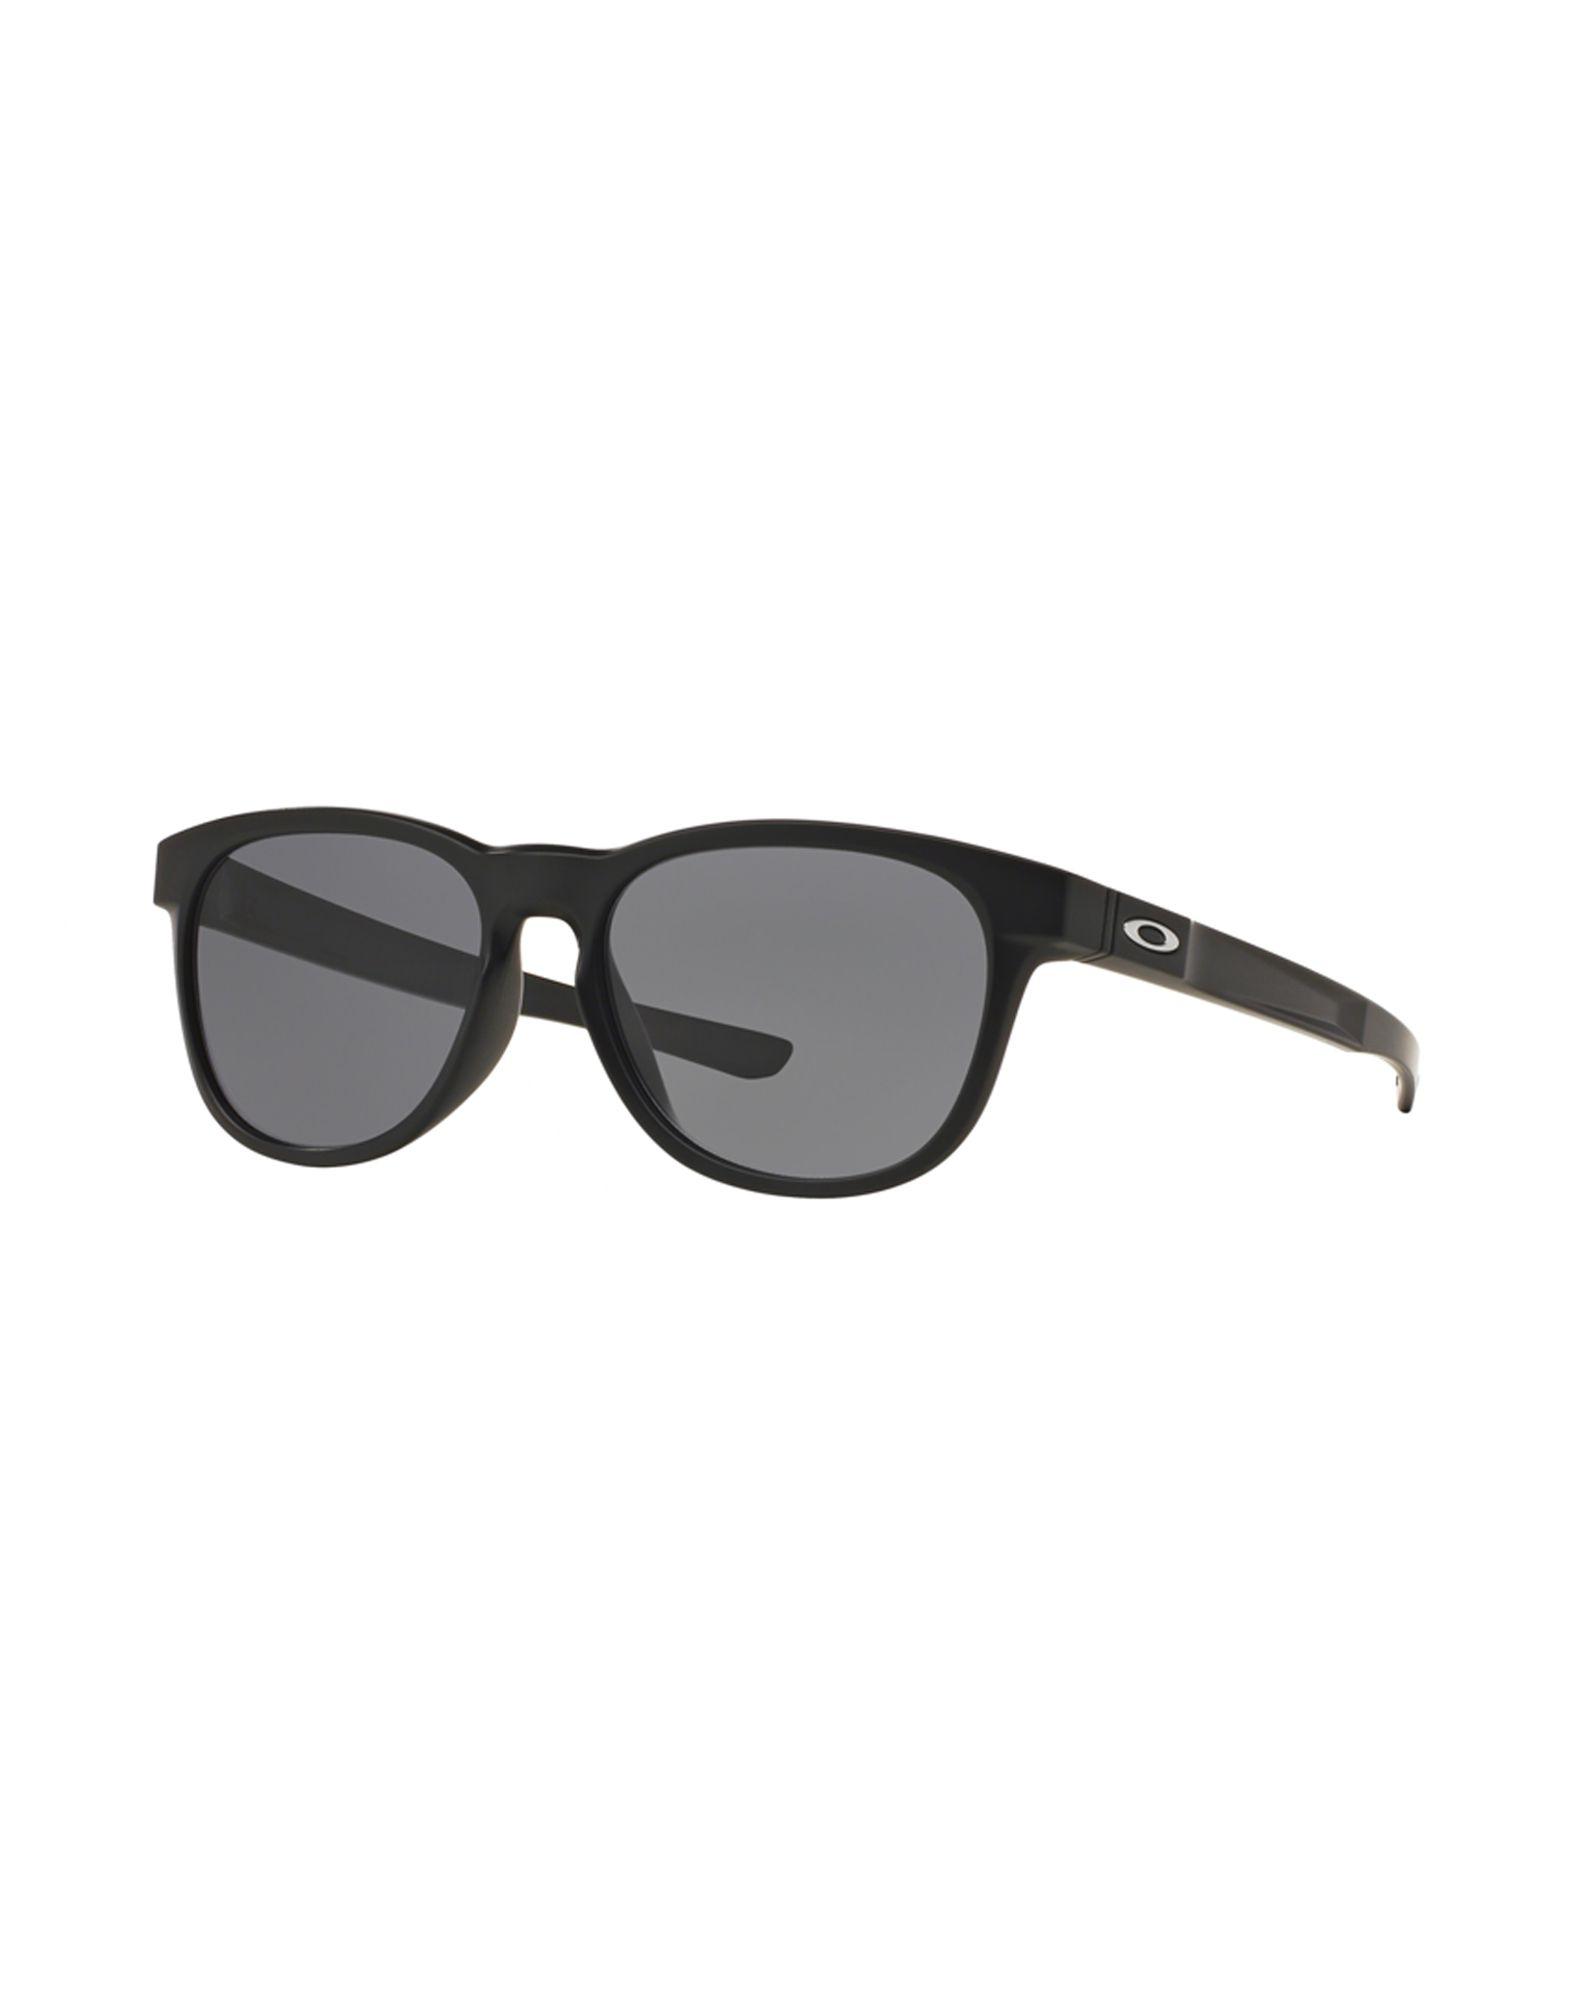 OAKLEY Солнечные очки солнцезащитные очки oakley 0oo9009 12 79